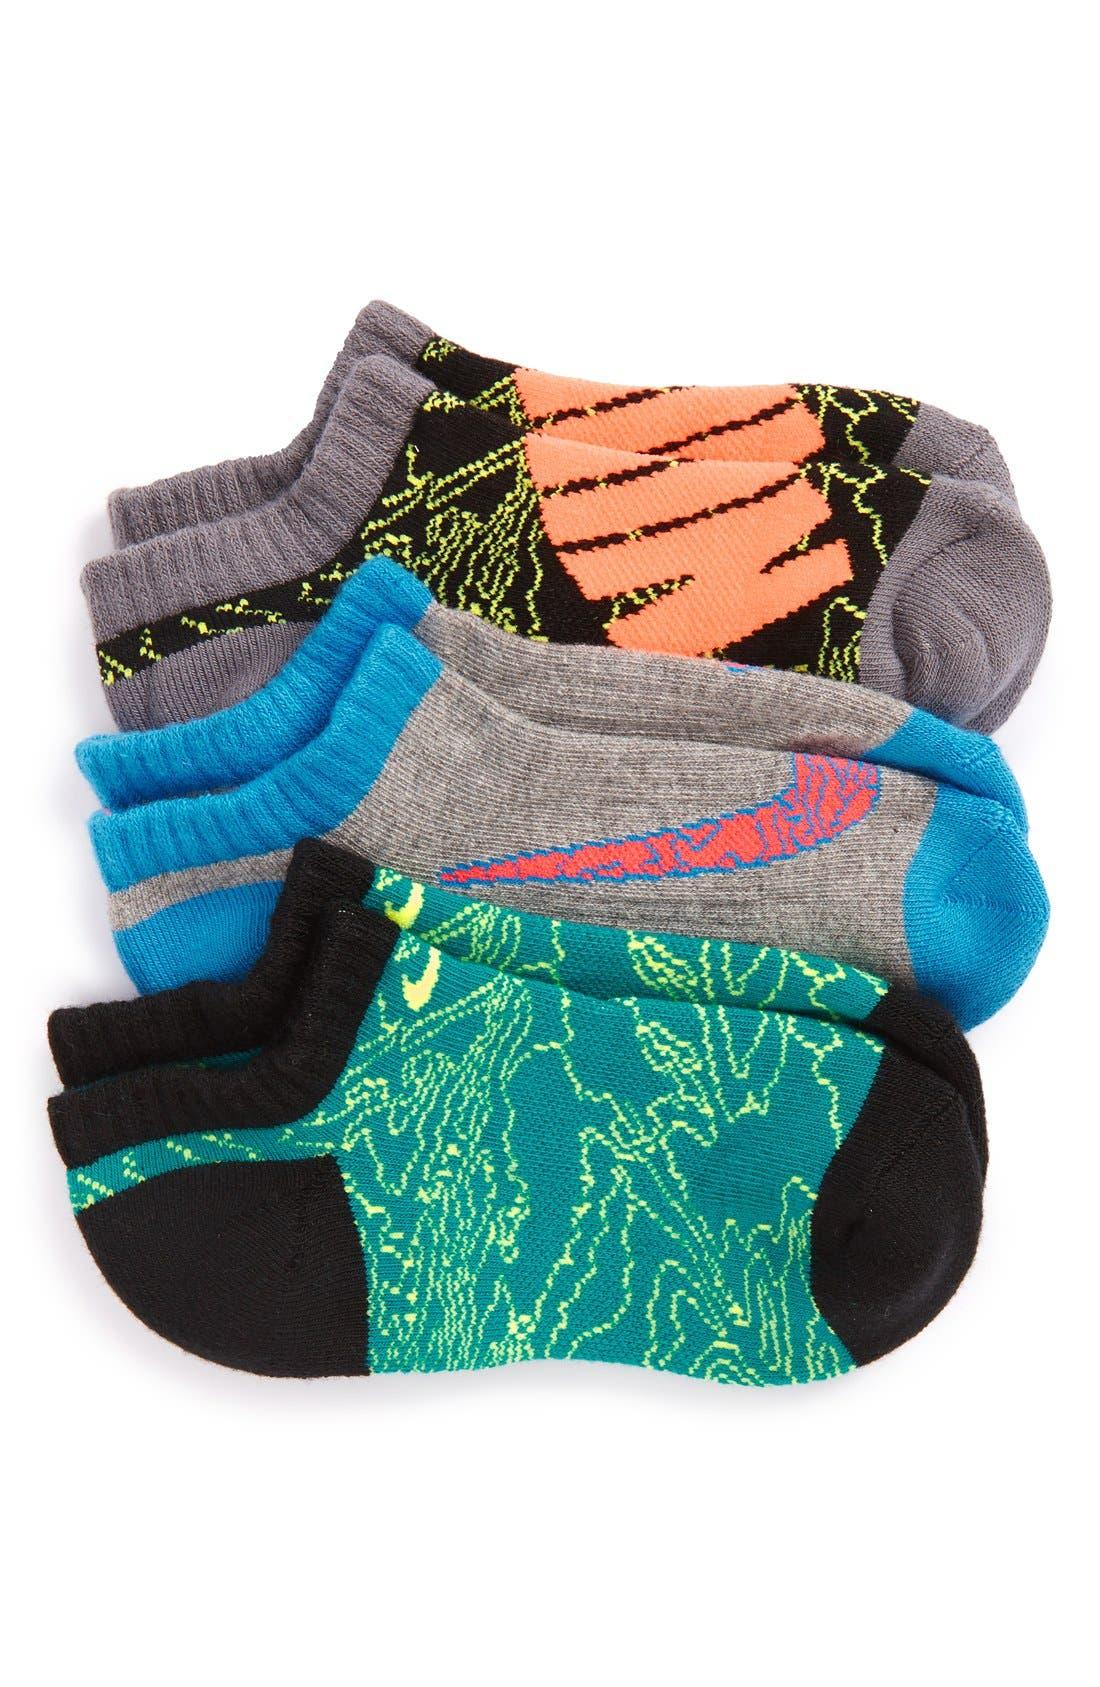 Main Image - Nike Performance 3-Pack No-Show Socks (Walker, Toddler, Little Kid & Big Kid)